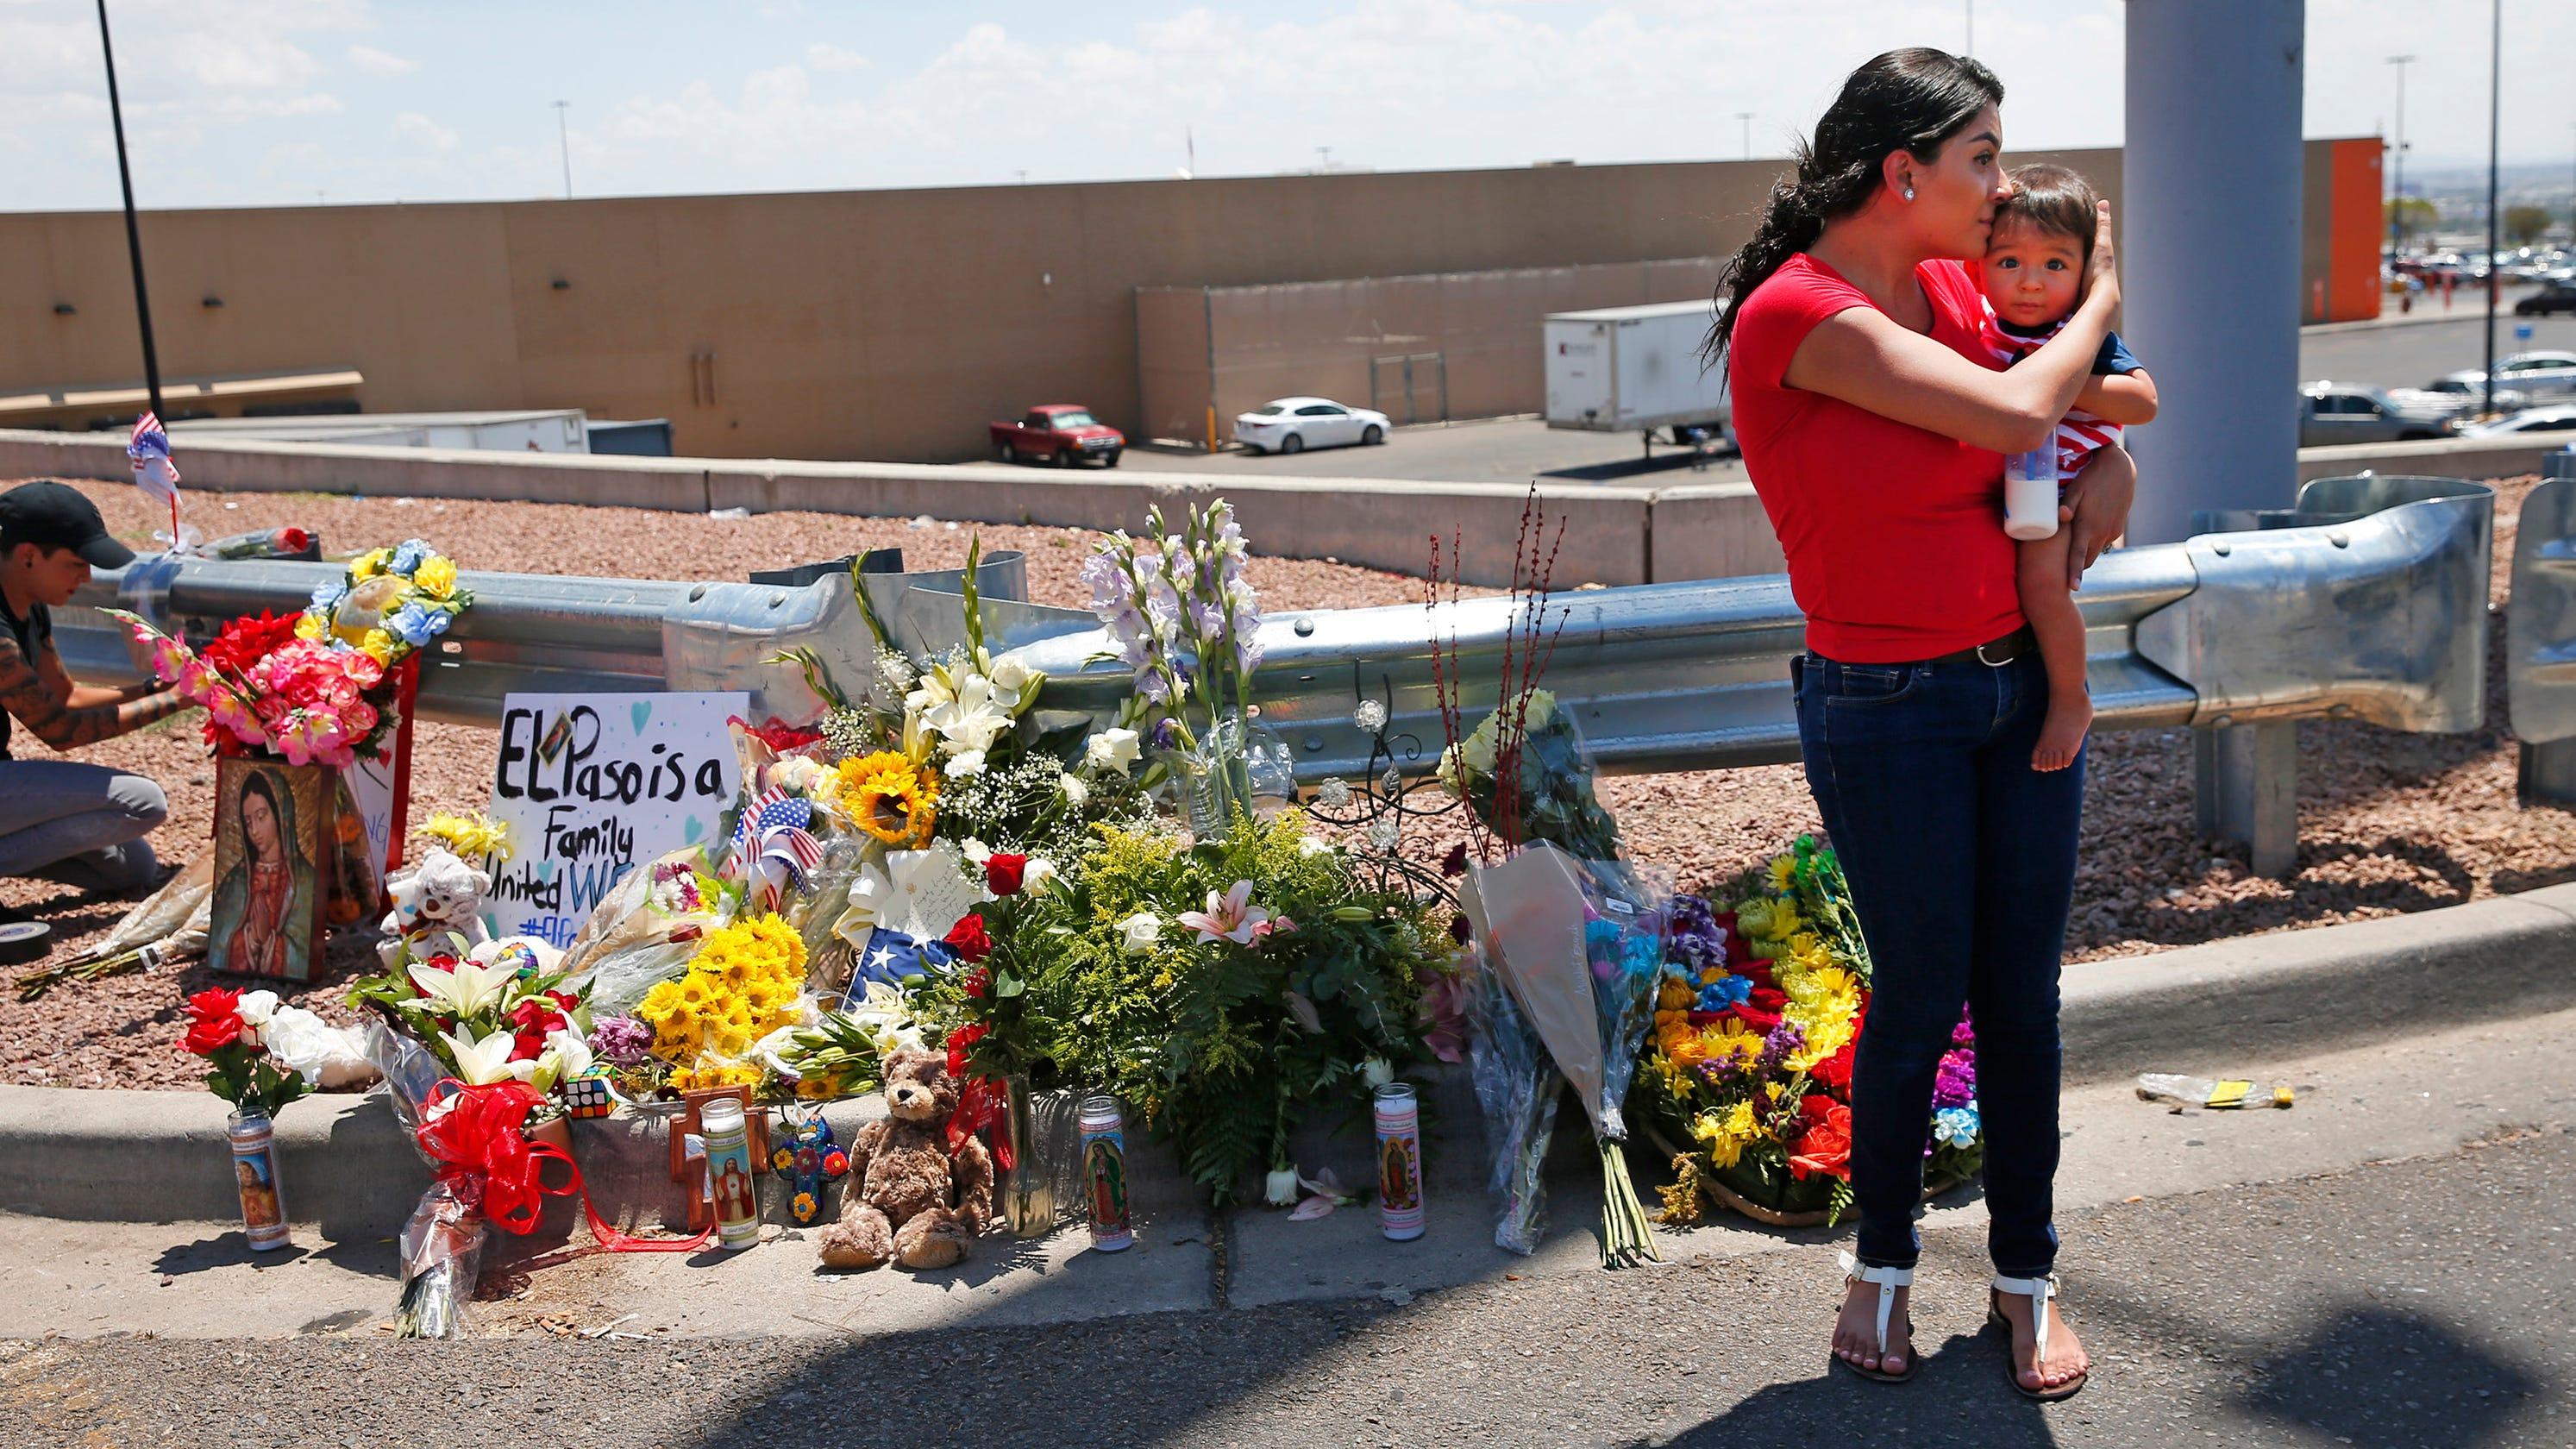 El Paso shooting and Dayton shooting: What Trump said